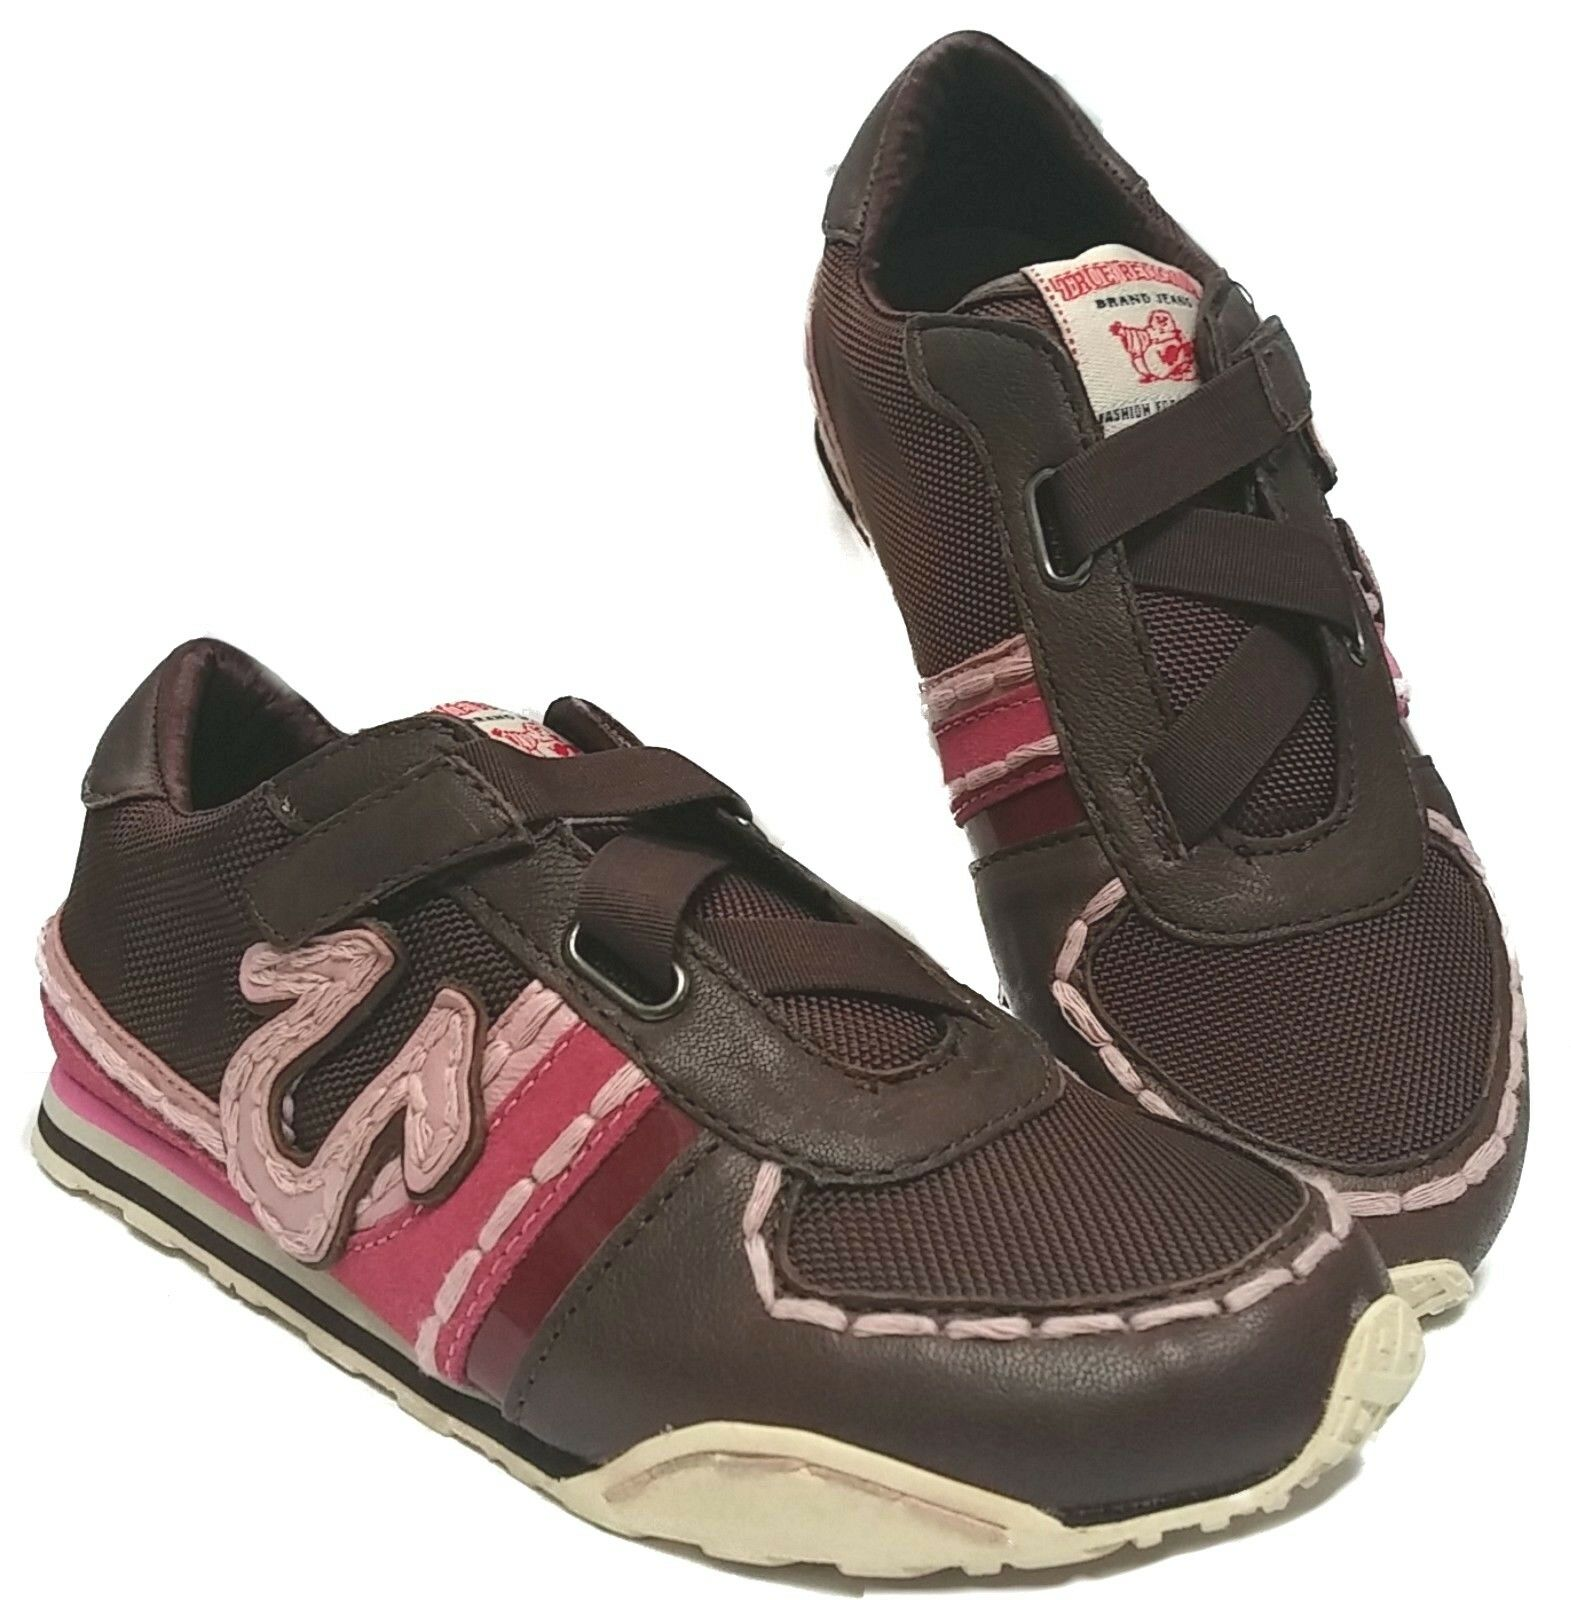 TRUE RELIGION TR582100-82B SPENCER Strap On Wmn's (M) Braun Mesh Lifestyle Schuhes